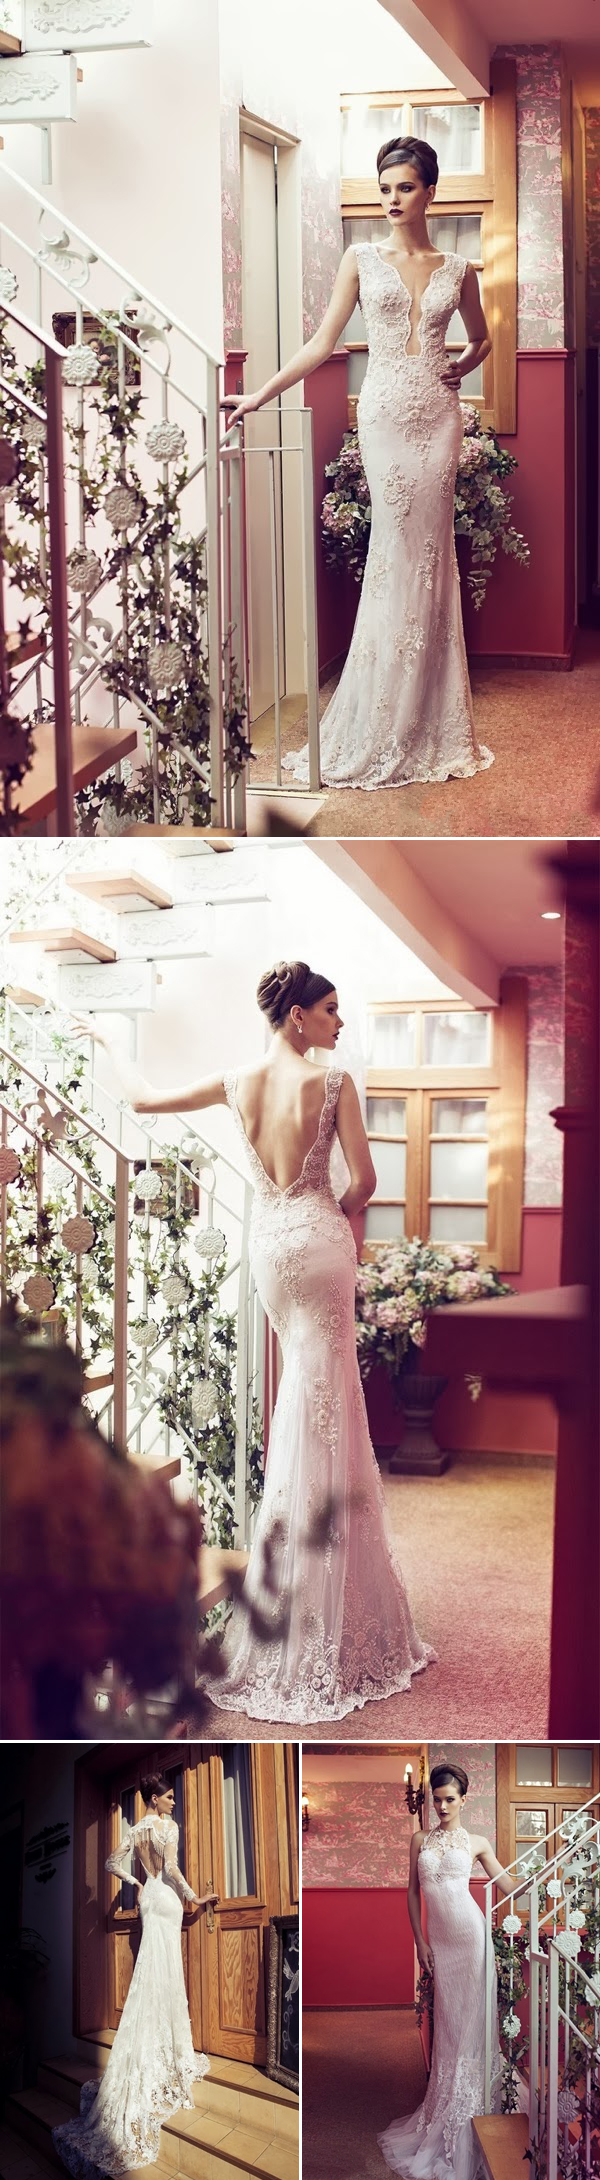 05-Riki Dalal Haute Couture